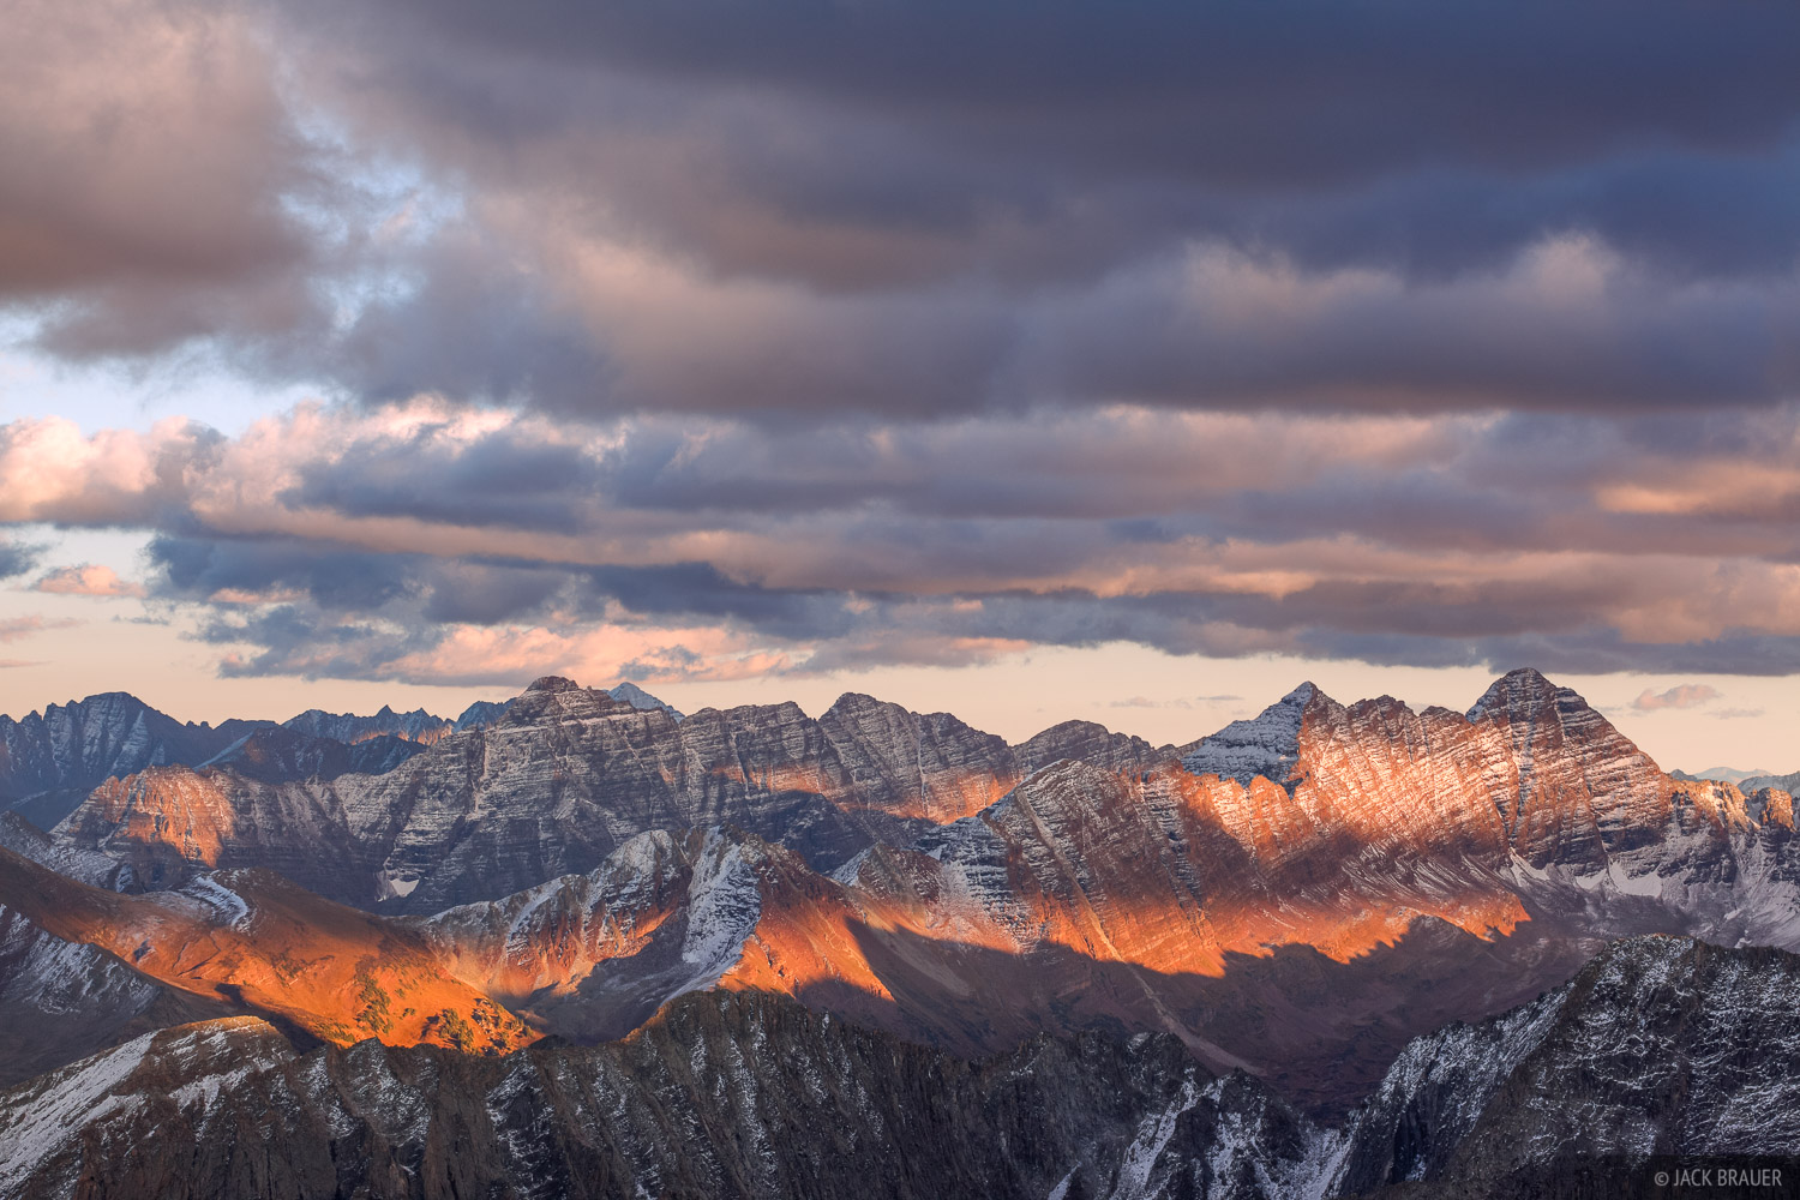 Elk Mountains, Maroon Bells, Pyramid Peak, sunset, Colorado, Maroon Bells-Snowmass Wilderness, photo